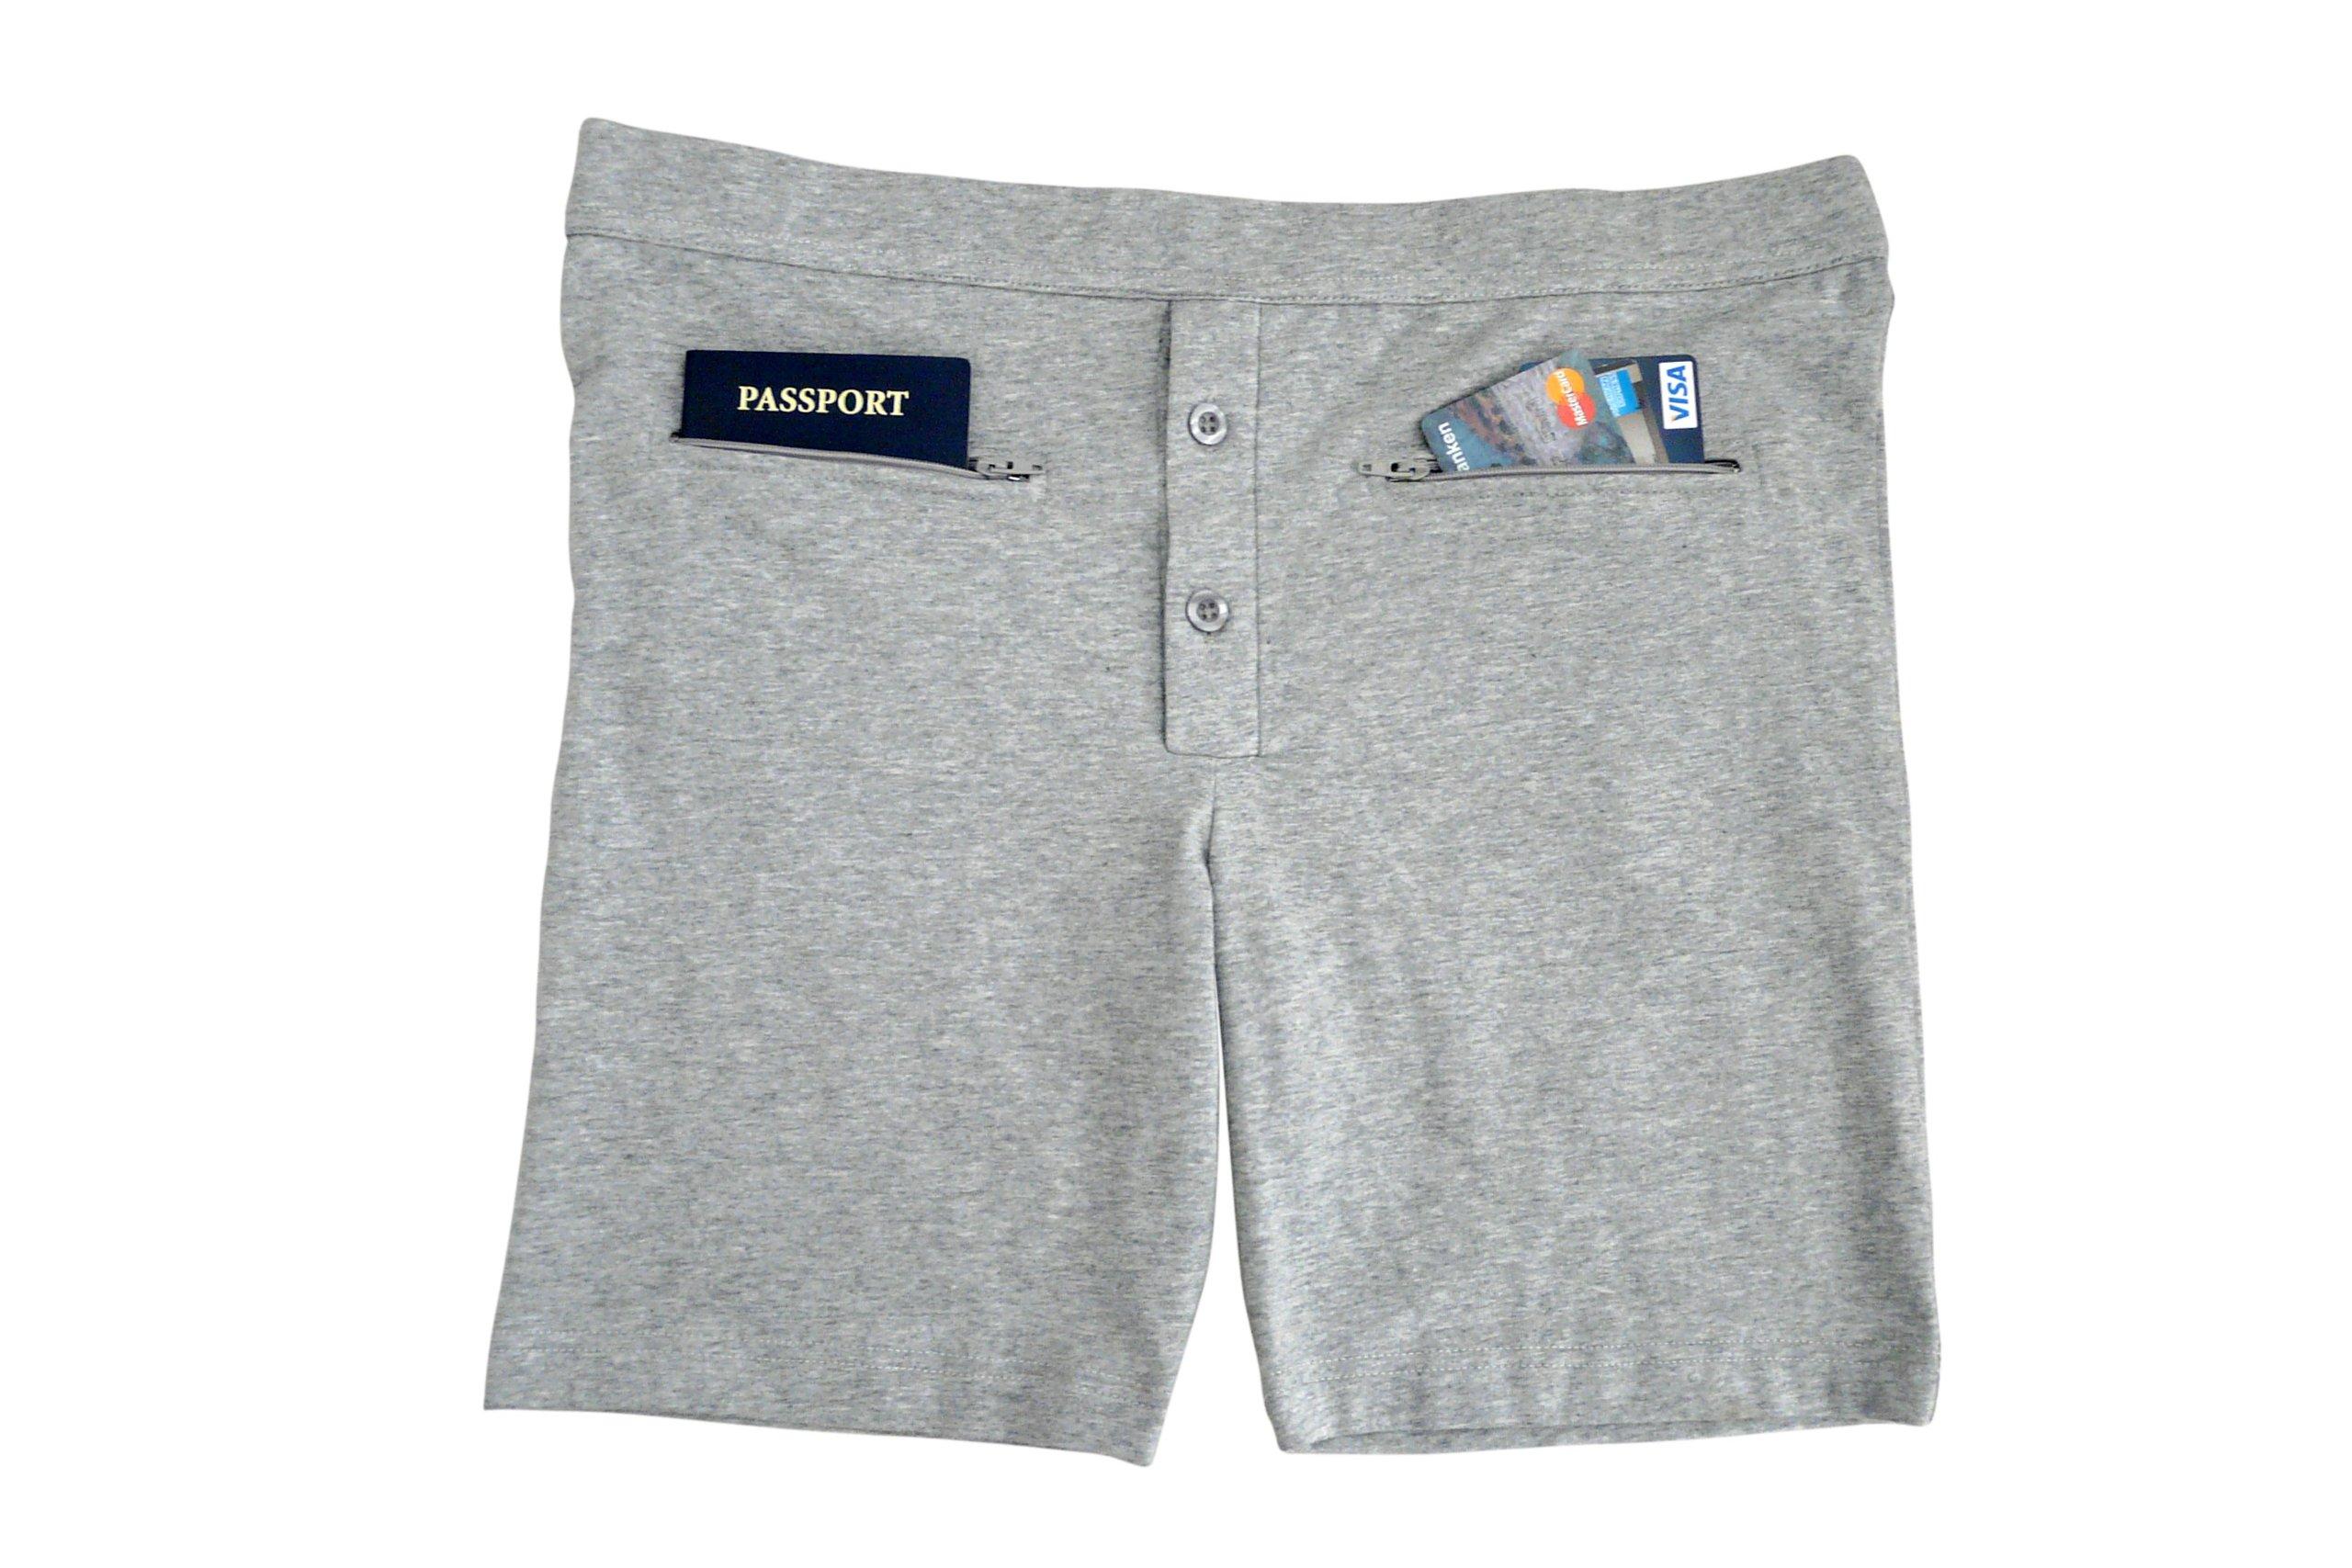 Clever Travel Companion Men's Underwear with Secret Pocket, Gray, X-Large